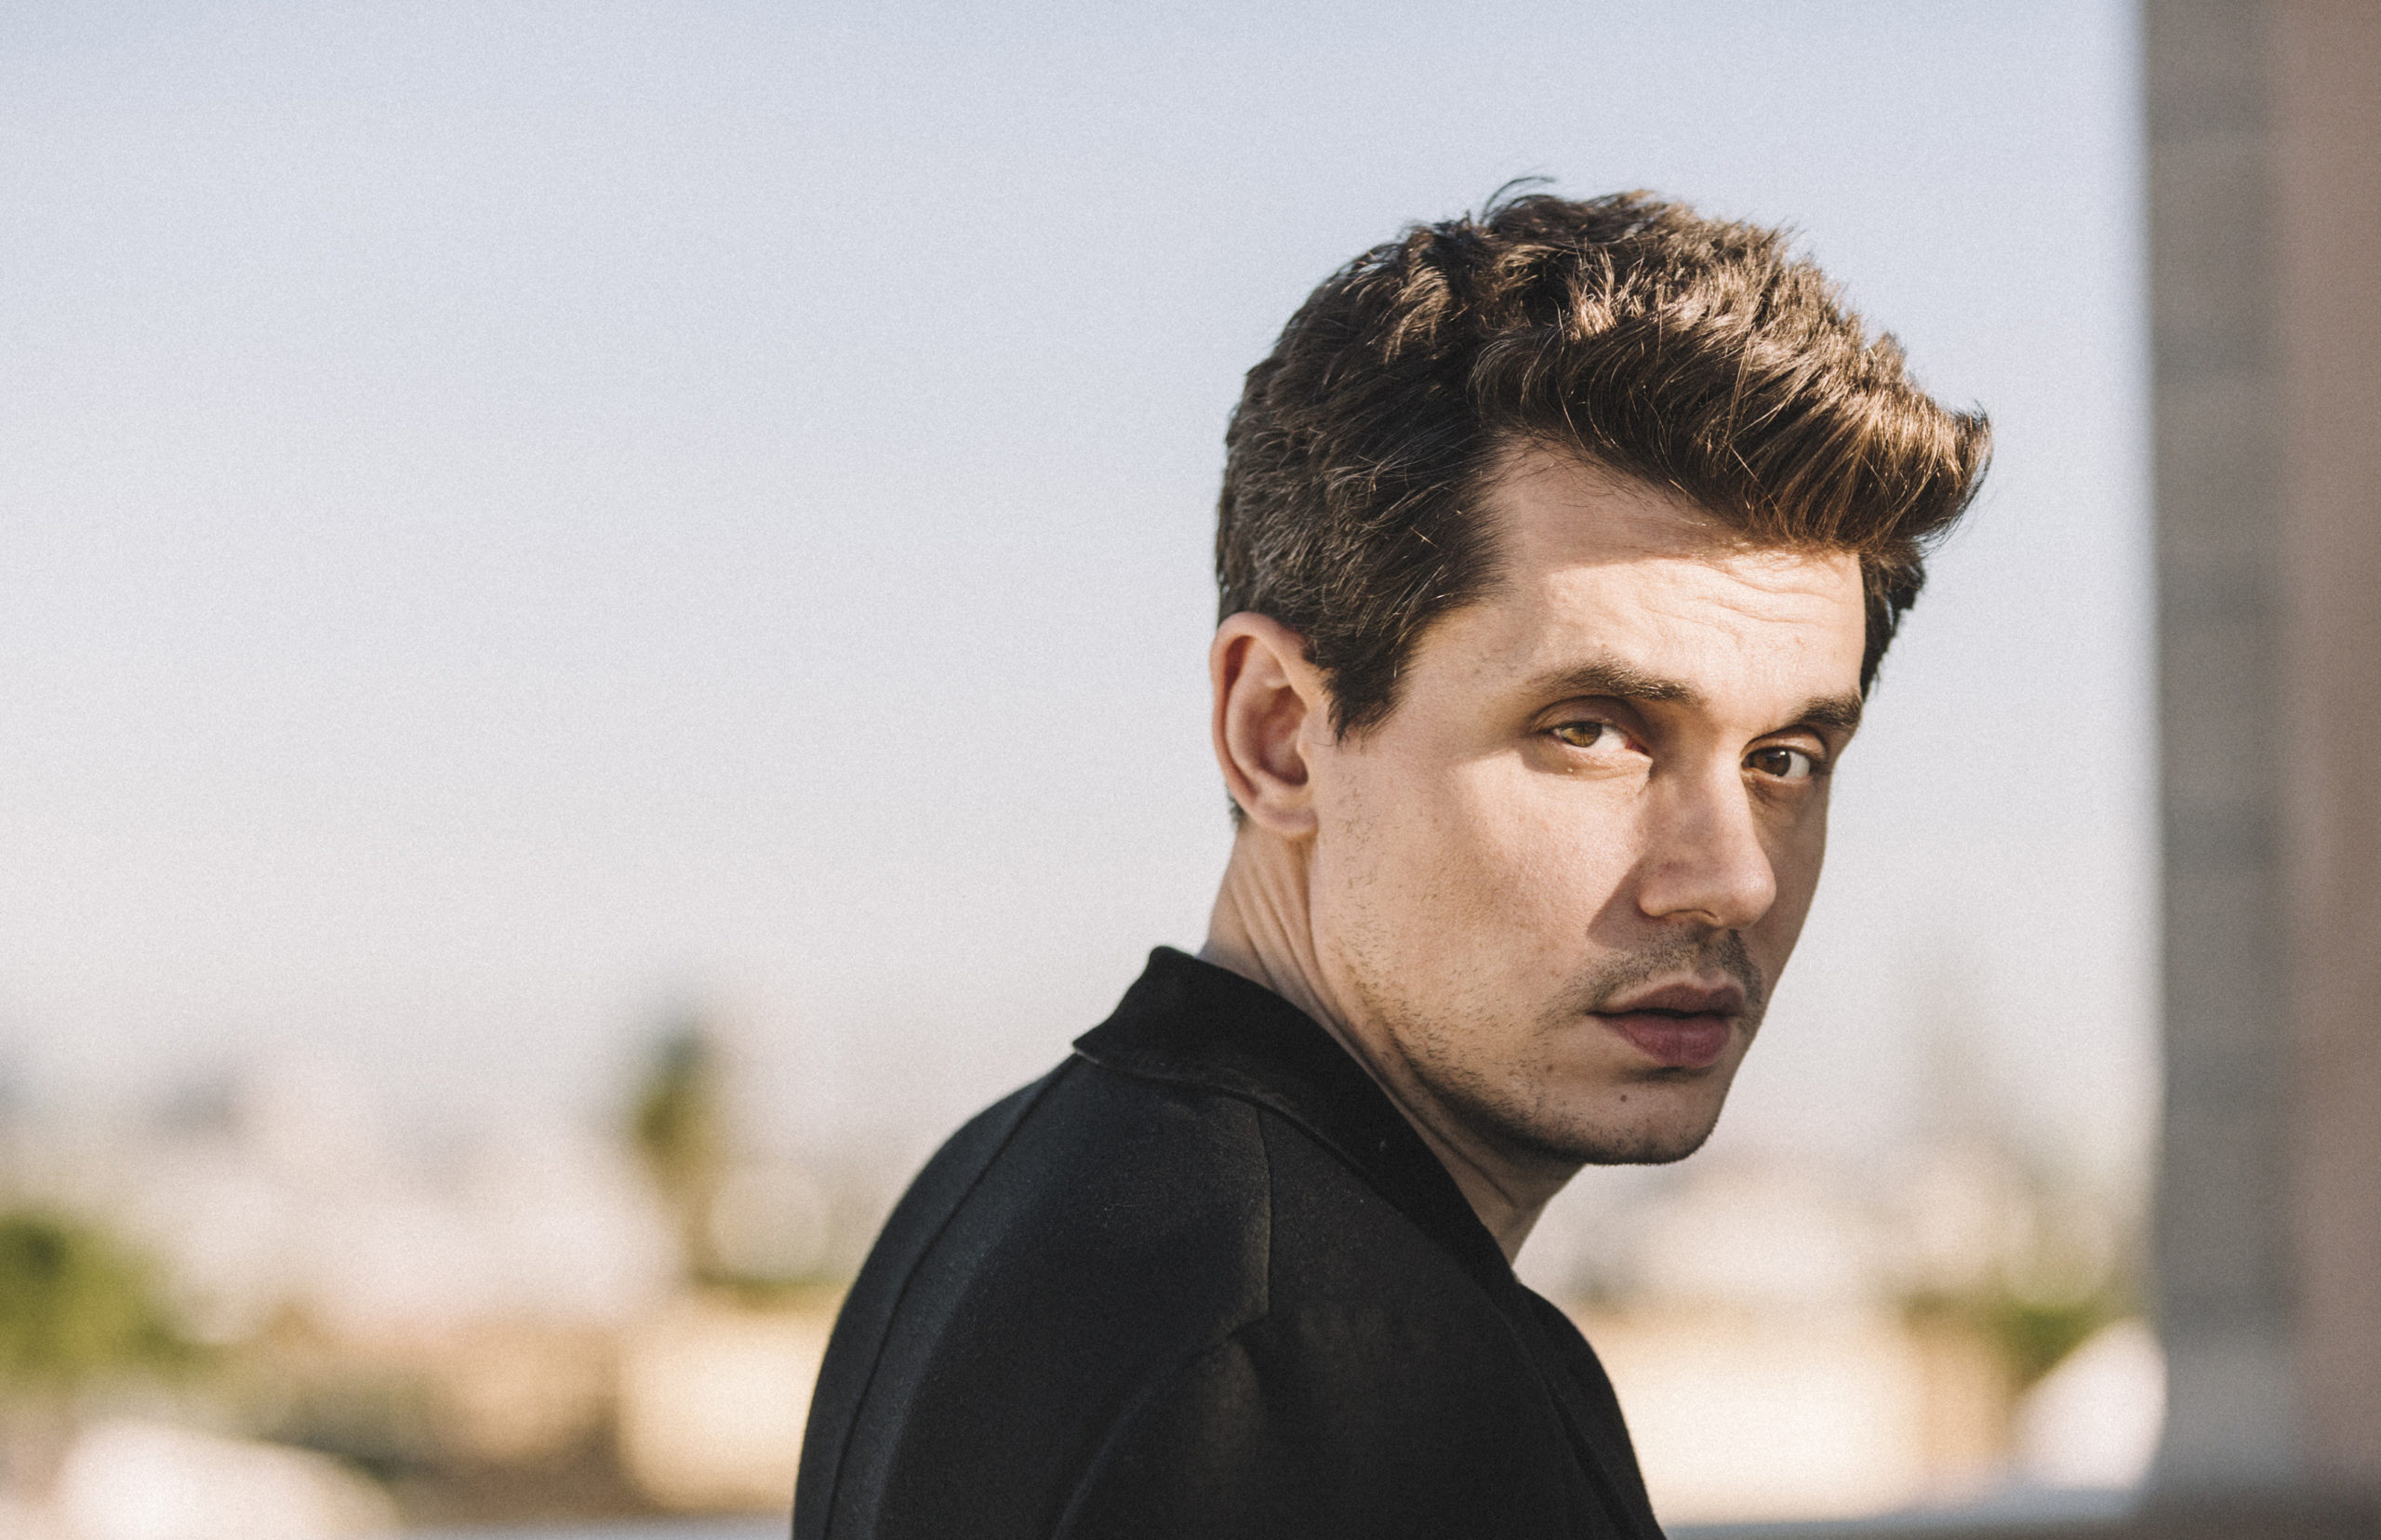 John Mayer, nearing 40, seeks a comeback | The Daily Gazette